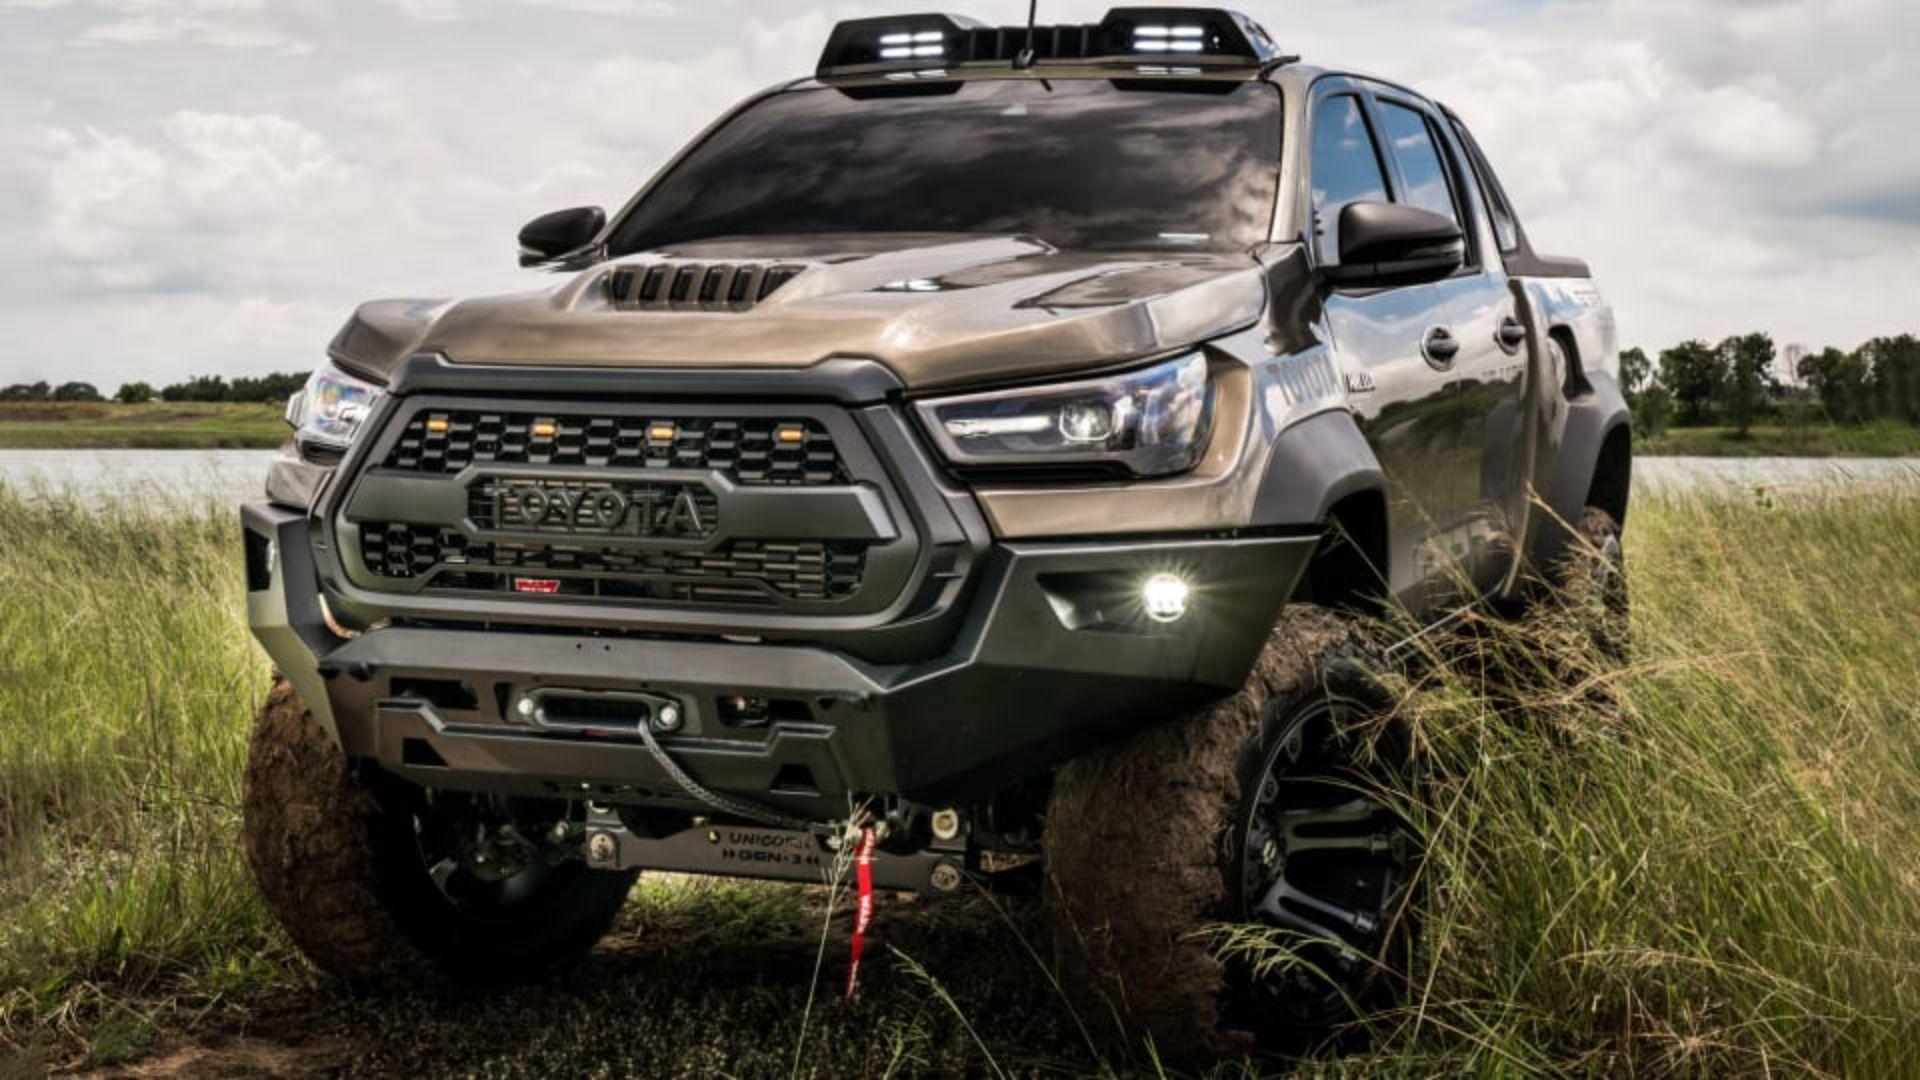 Toyota-Hilux-Pathfinder-by-RAD-1